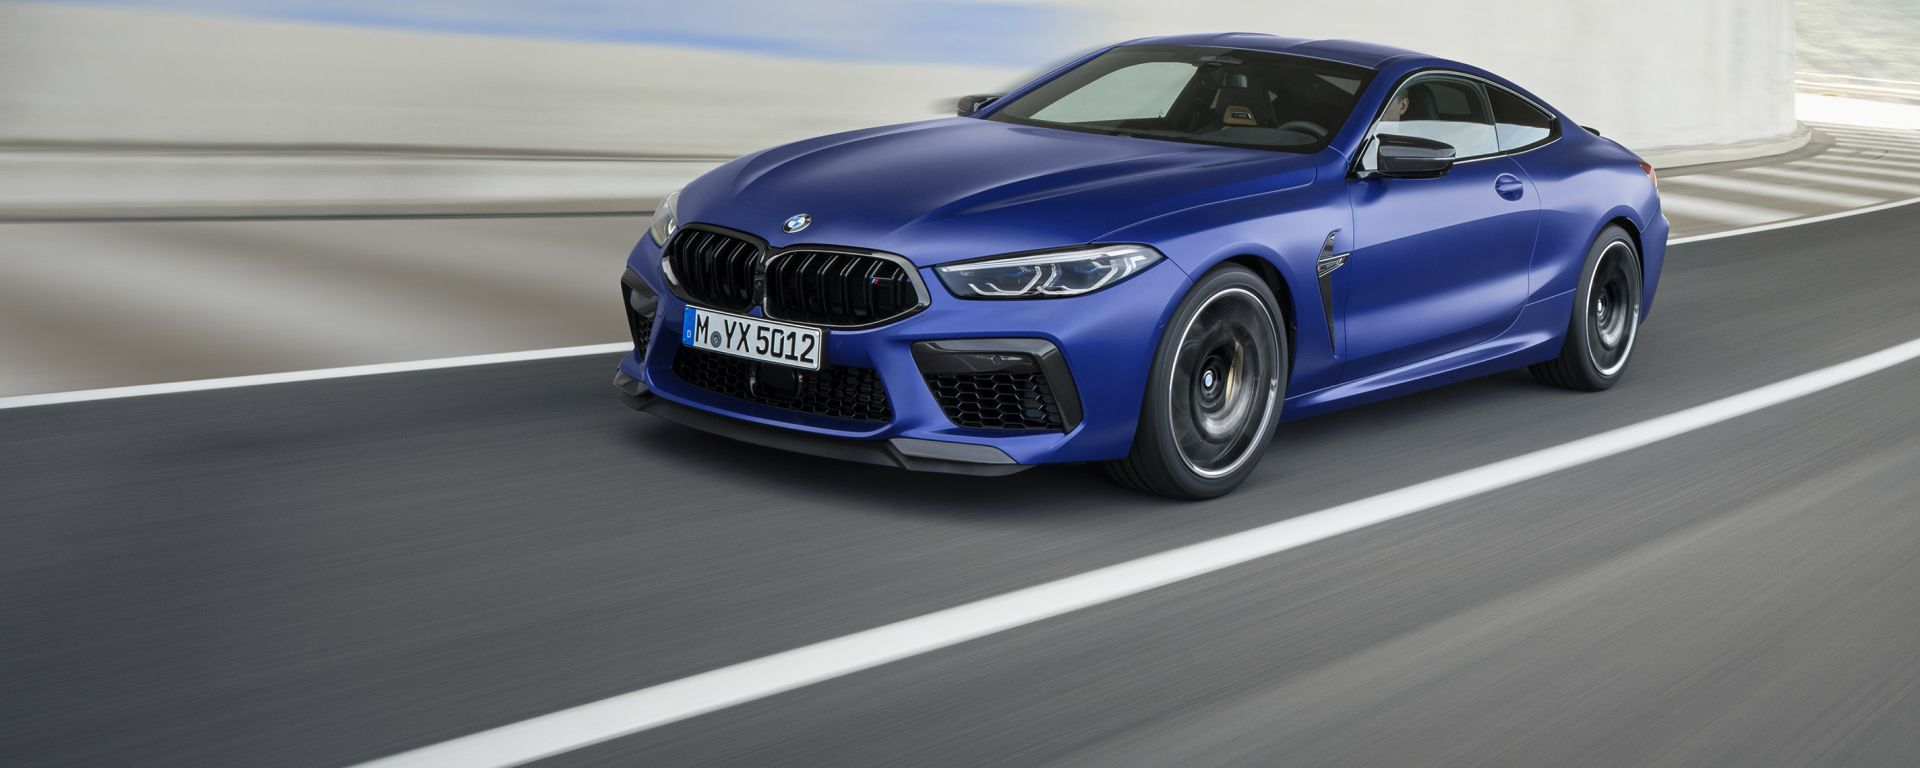 BMW M8 Competition Coupé, vista 3/4 anteriore